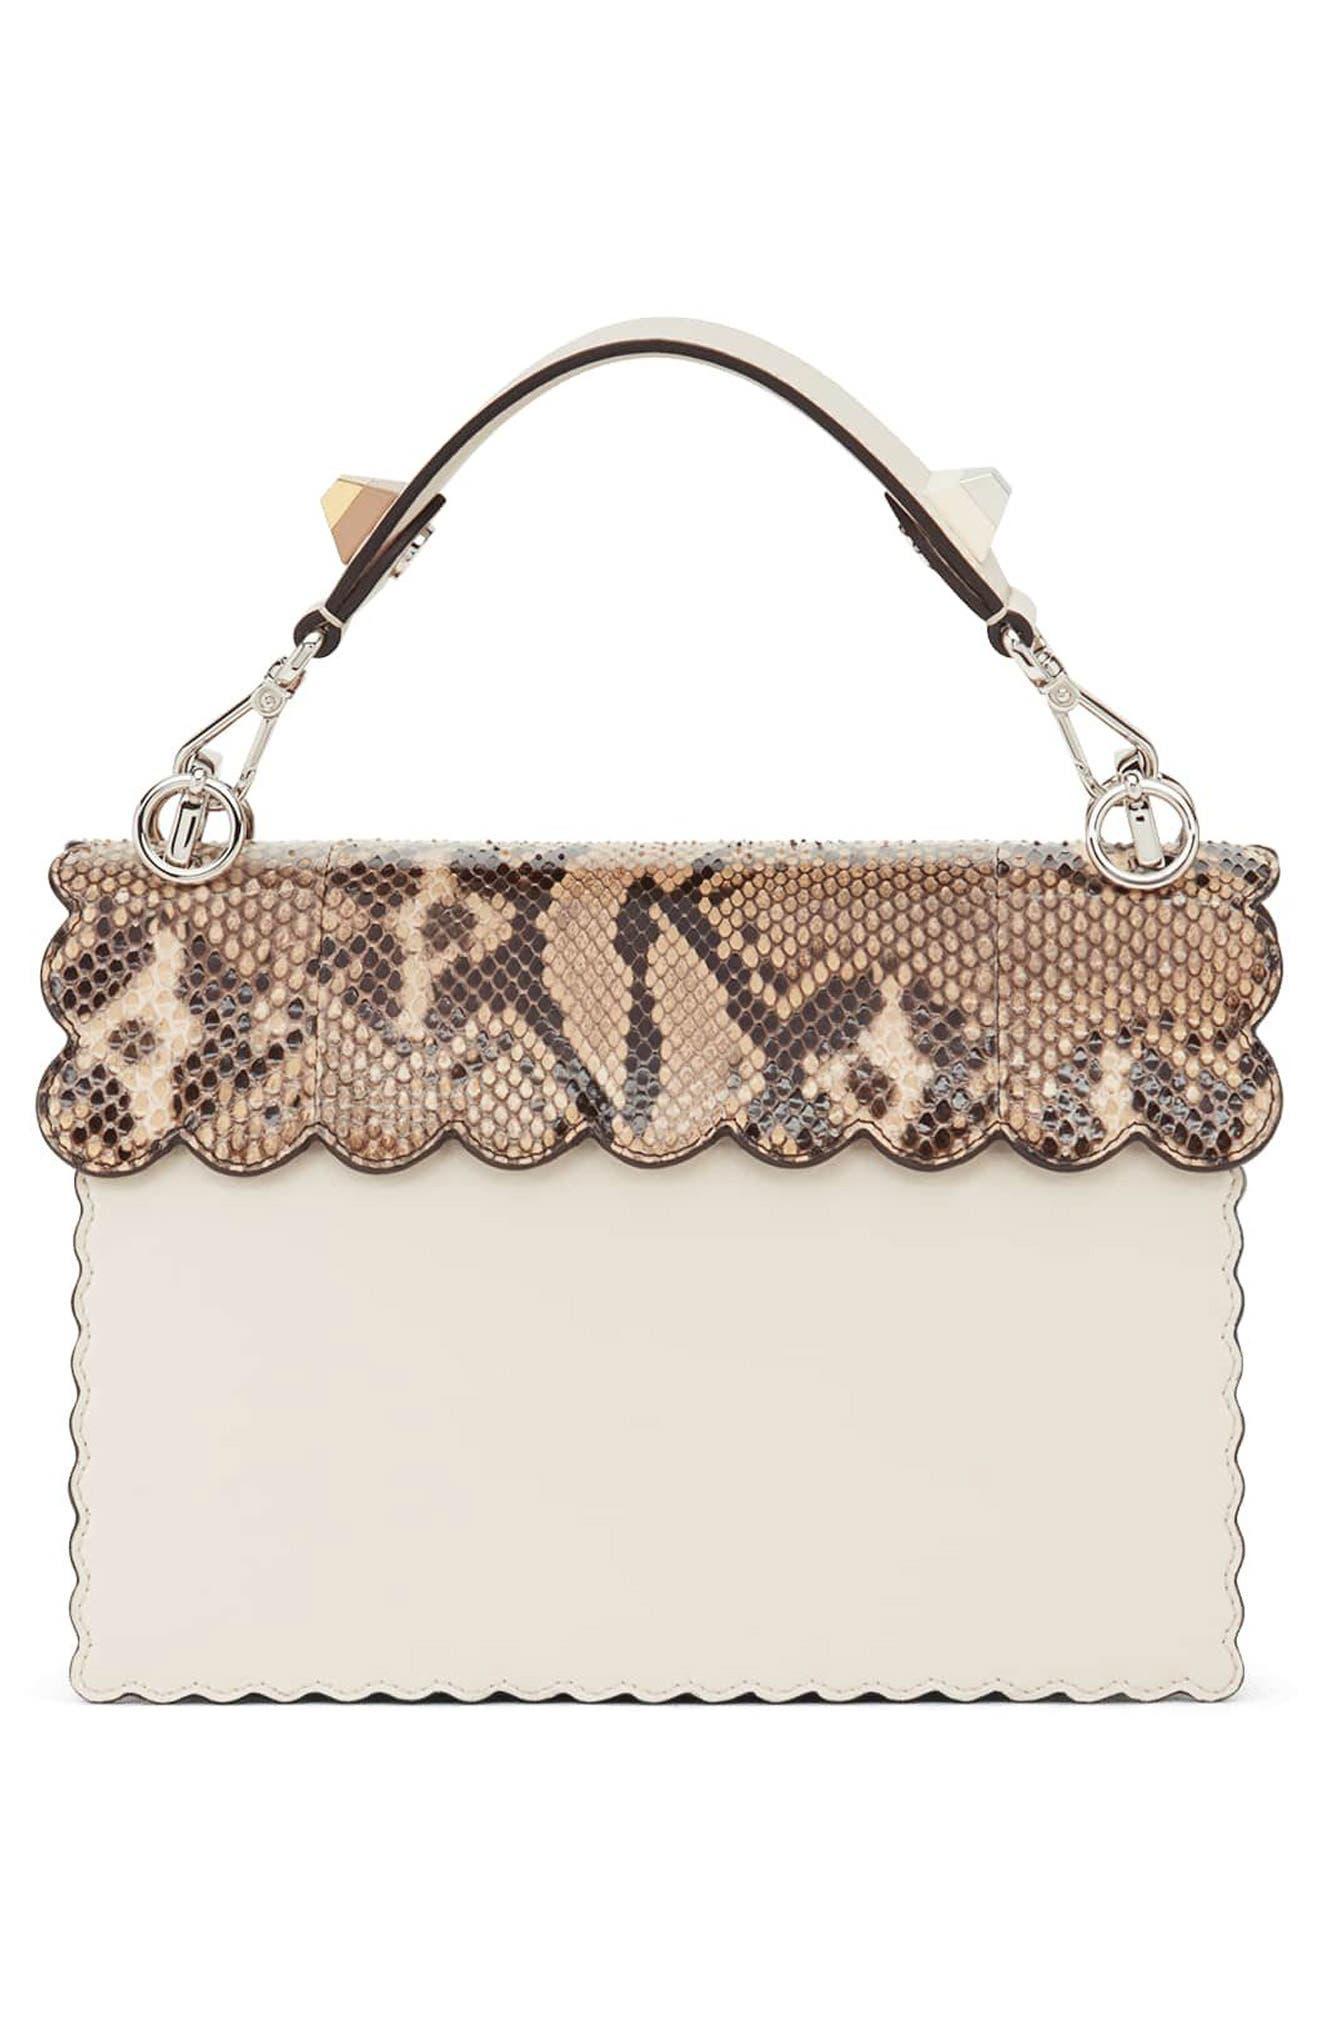 Small Kan I Genuine Python & Calfskin Shoulder Bag,                             Alternate thumbnail 2, color,                             Camelia/ Makeup/ Python